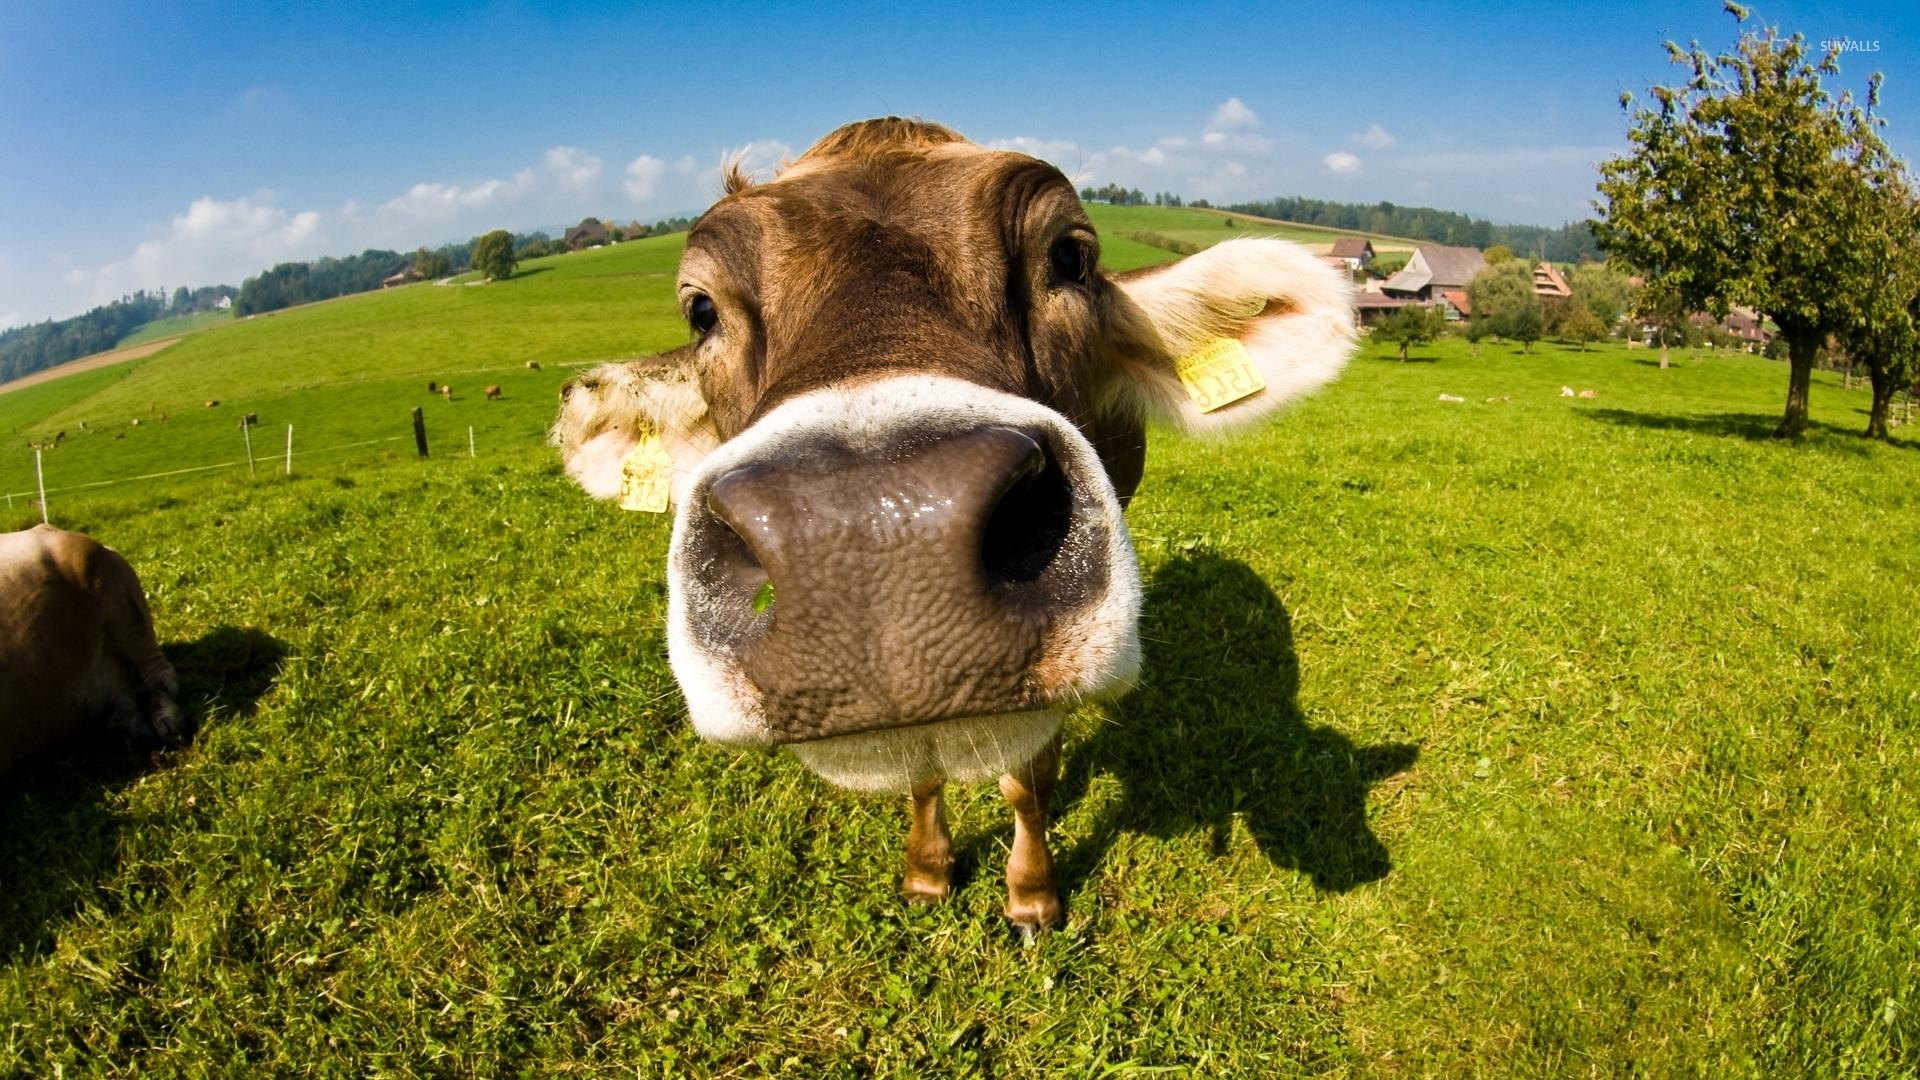 cow image wallpapers 51 wallpapers � wallpapers for desktop